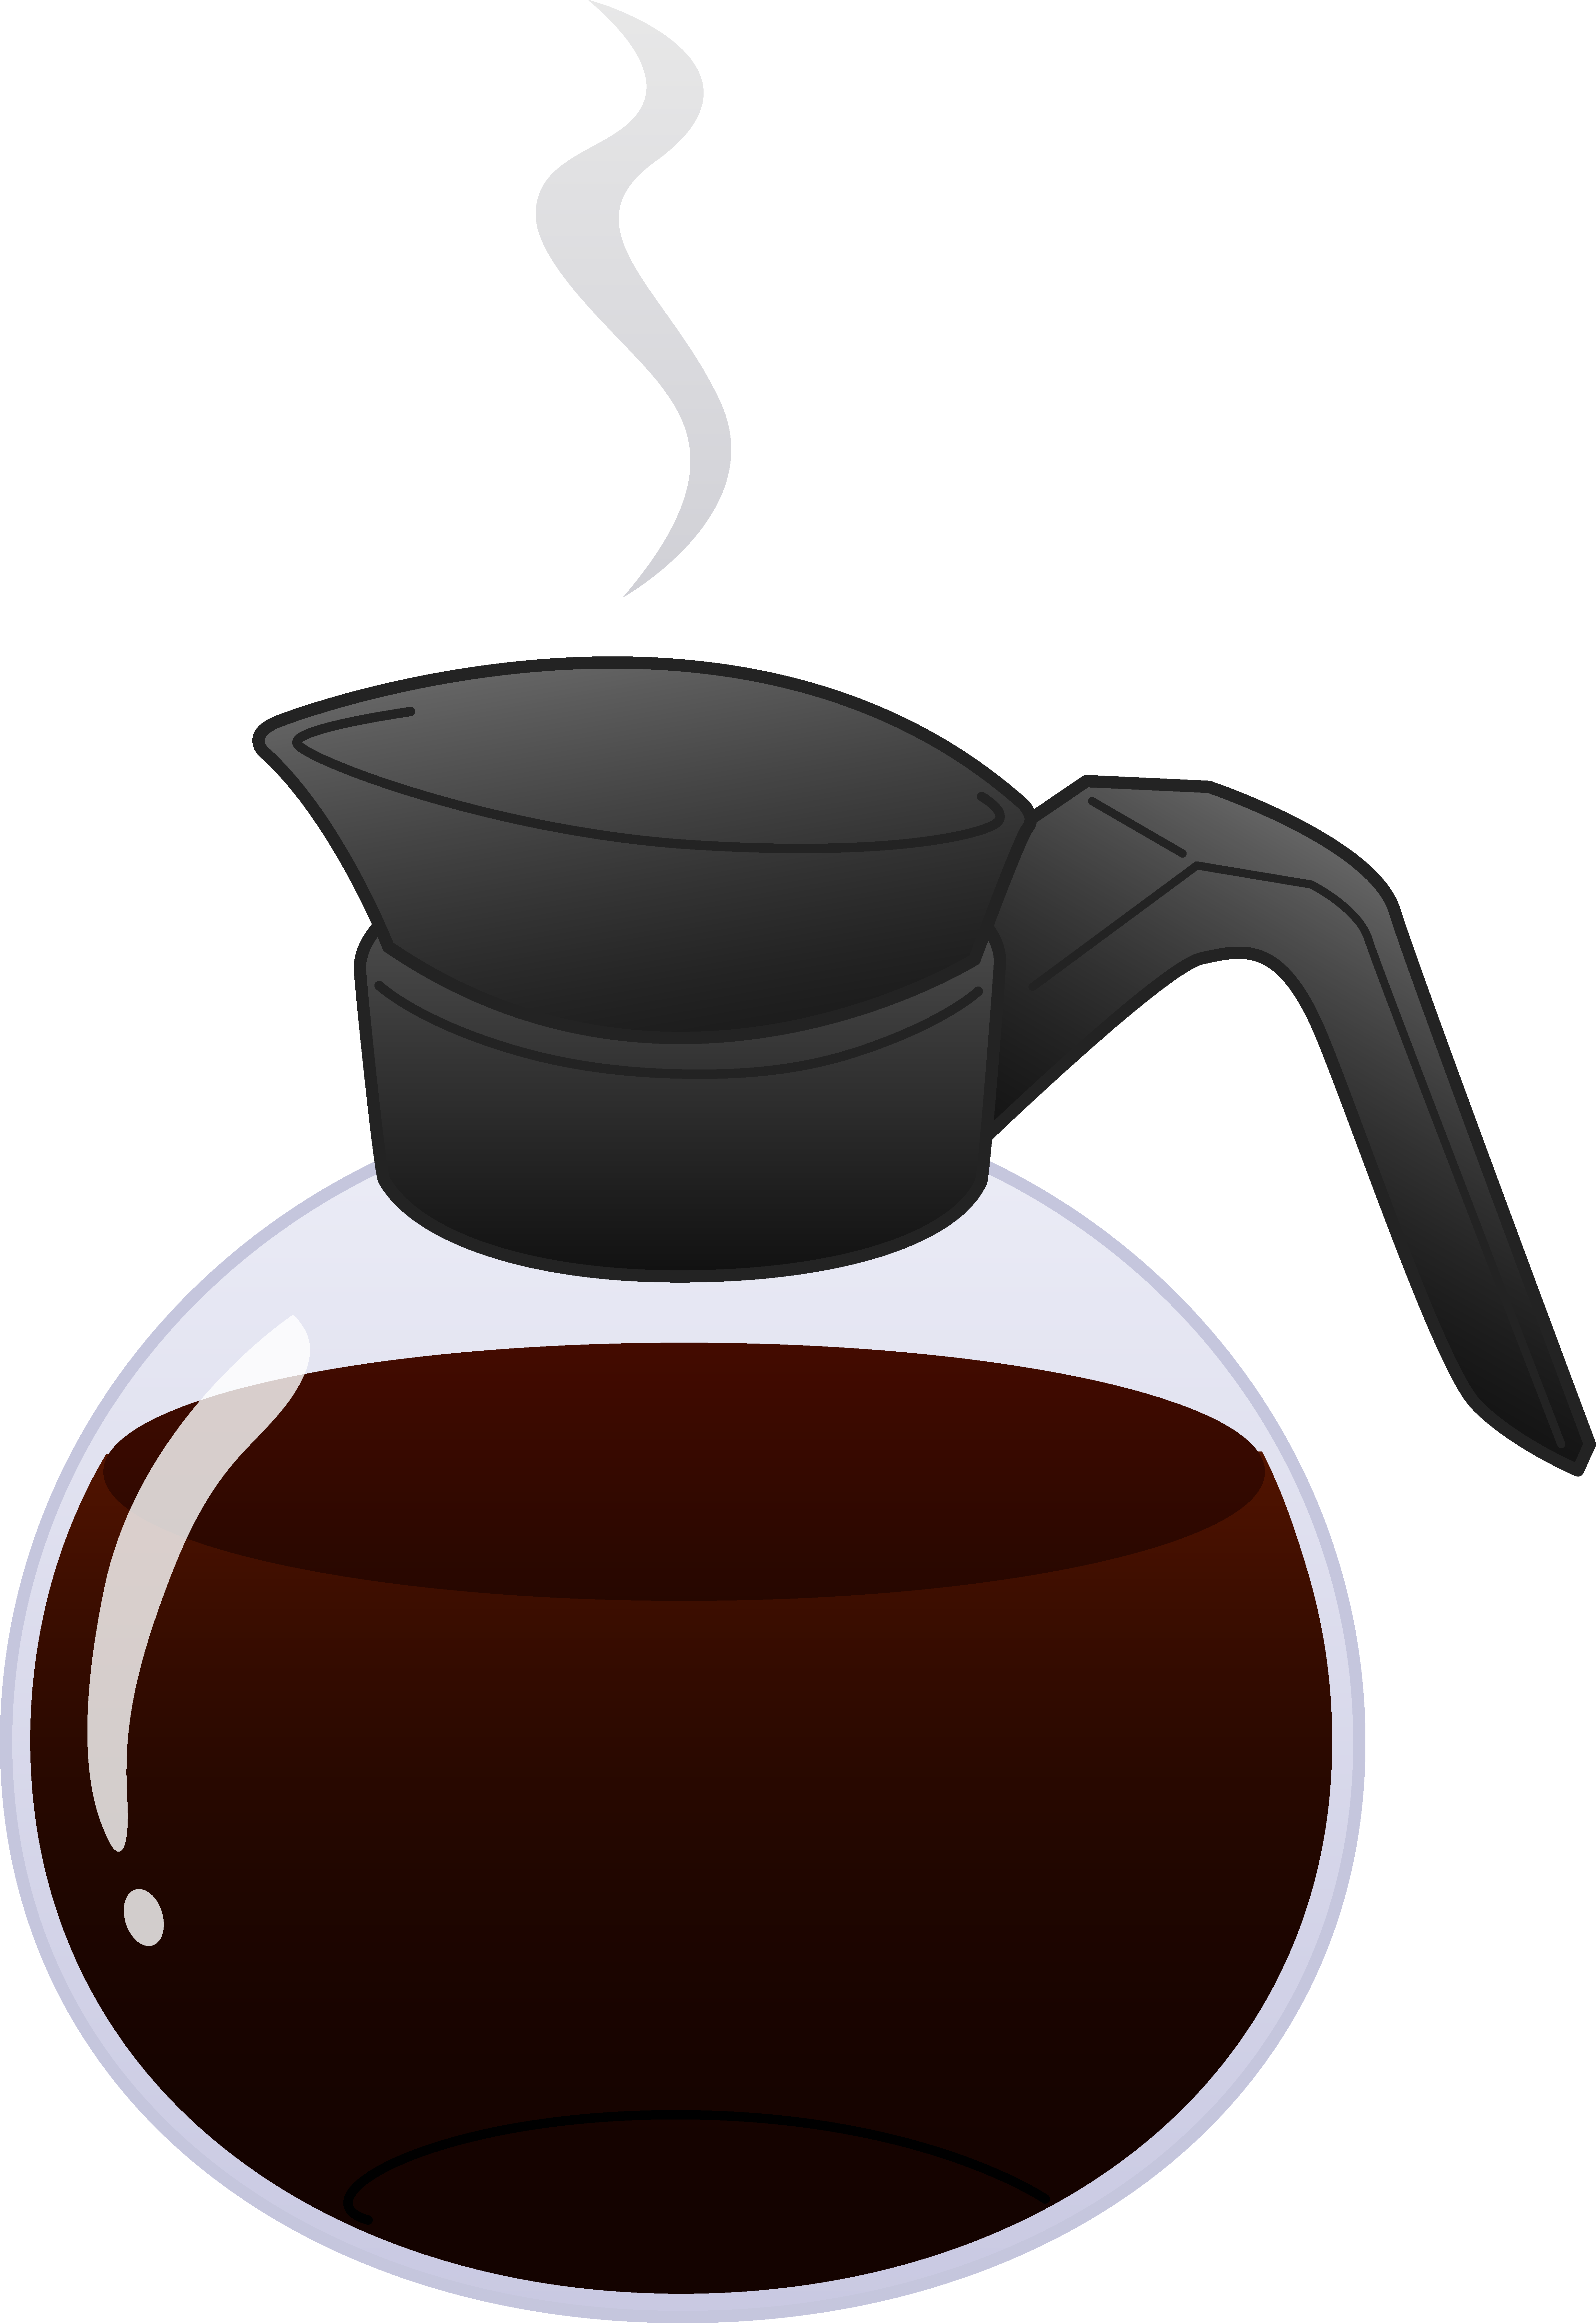 Coffee jugs clipart #3